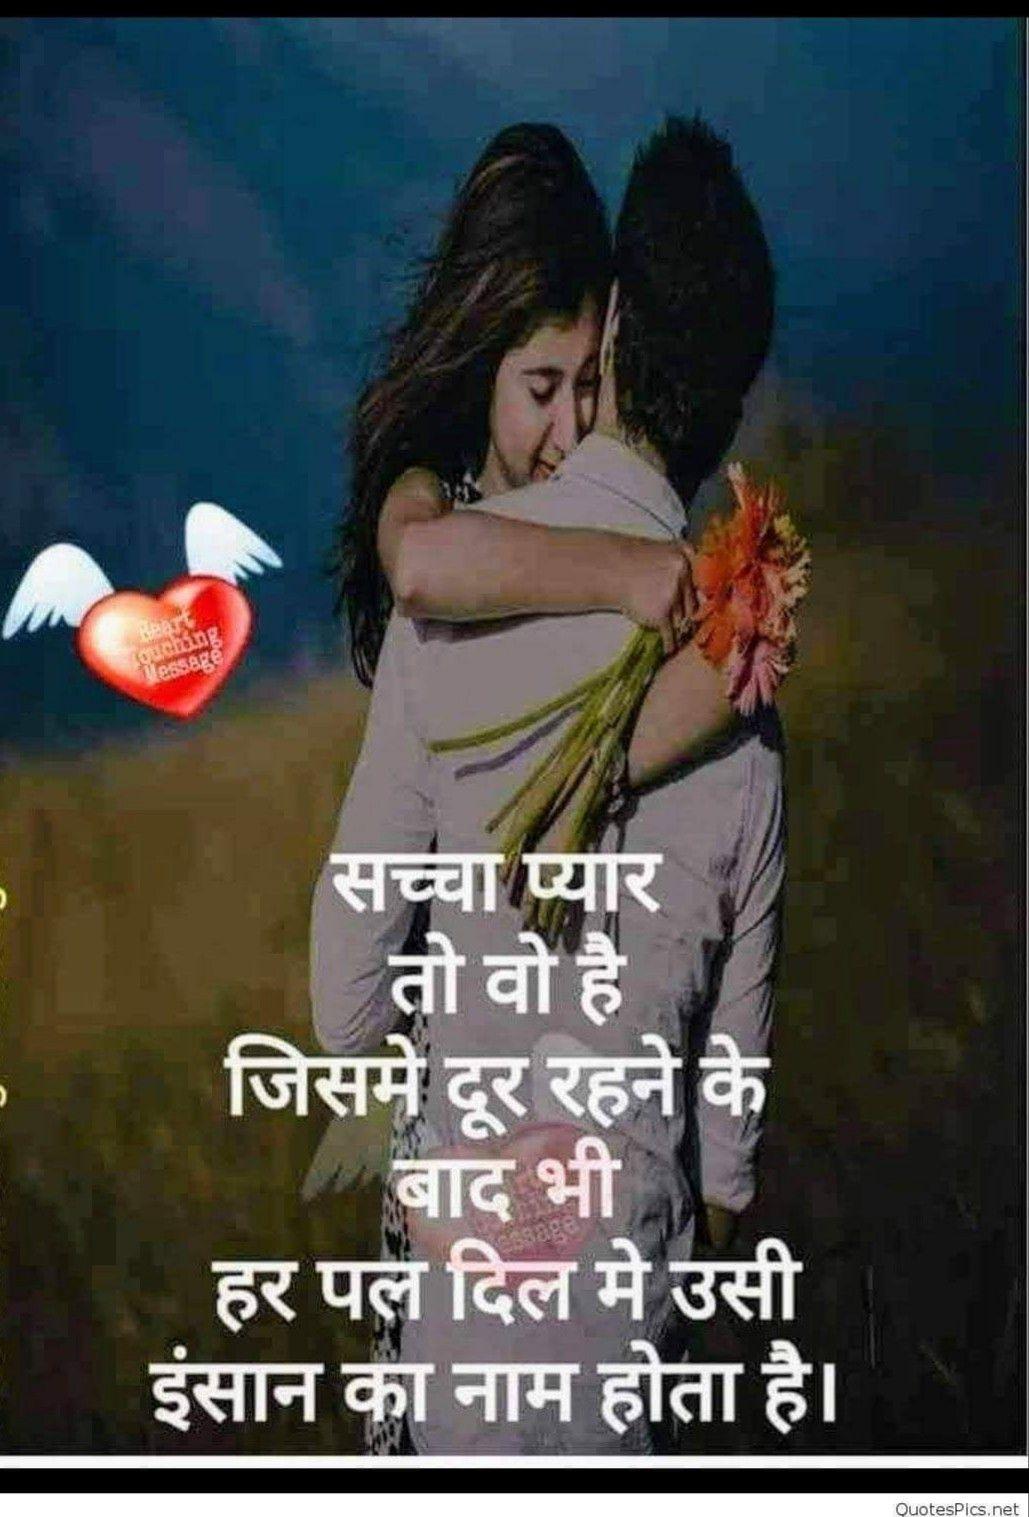 Pin By Sashina Devi On Shayaries N Beautiful Quotes Hindi Shayari Love Shayari In Hindi Love Quotes For Girlfriend